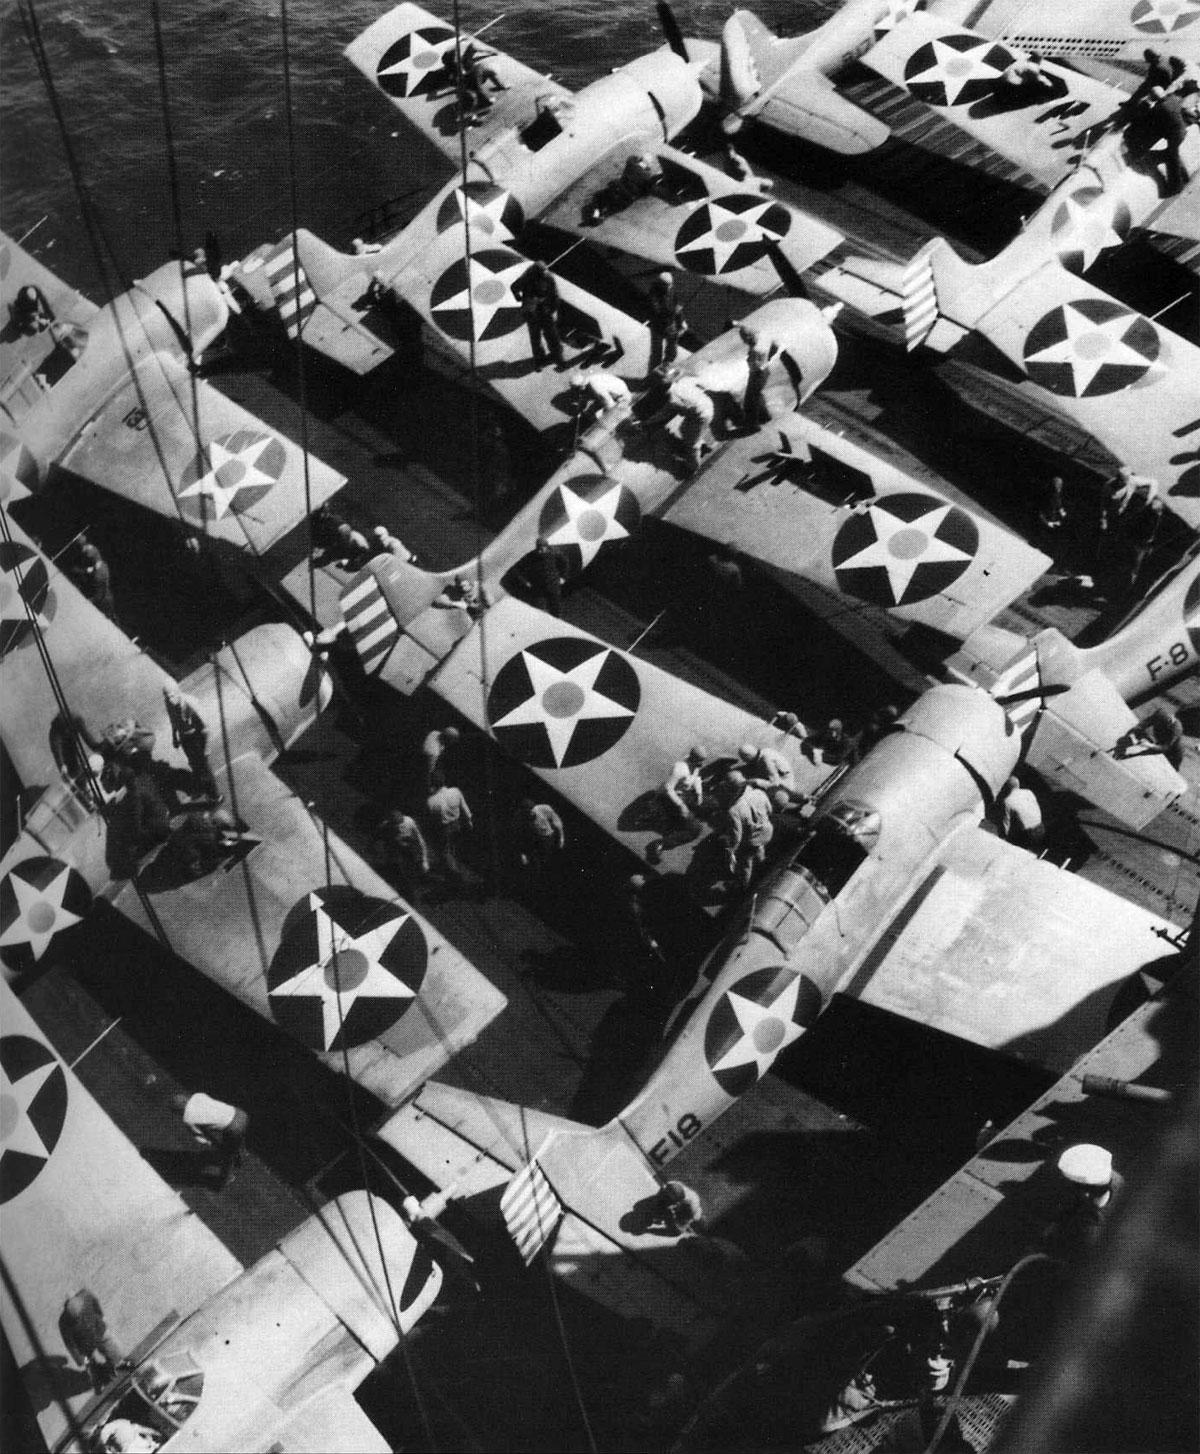 Grumman F4F 4 Wildcat VF 6 6F2 USS Enterprise 1942 02